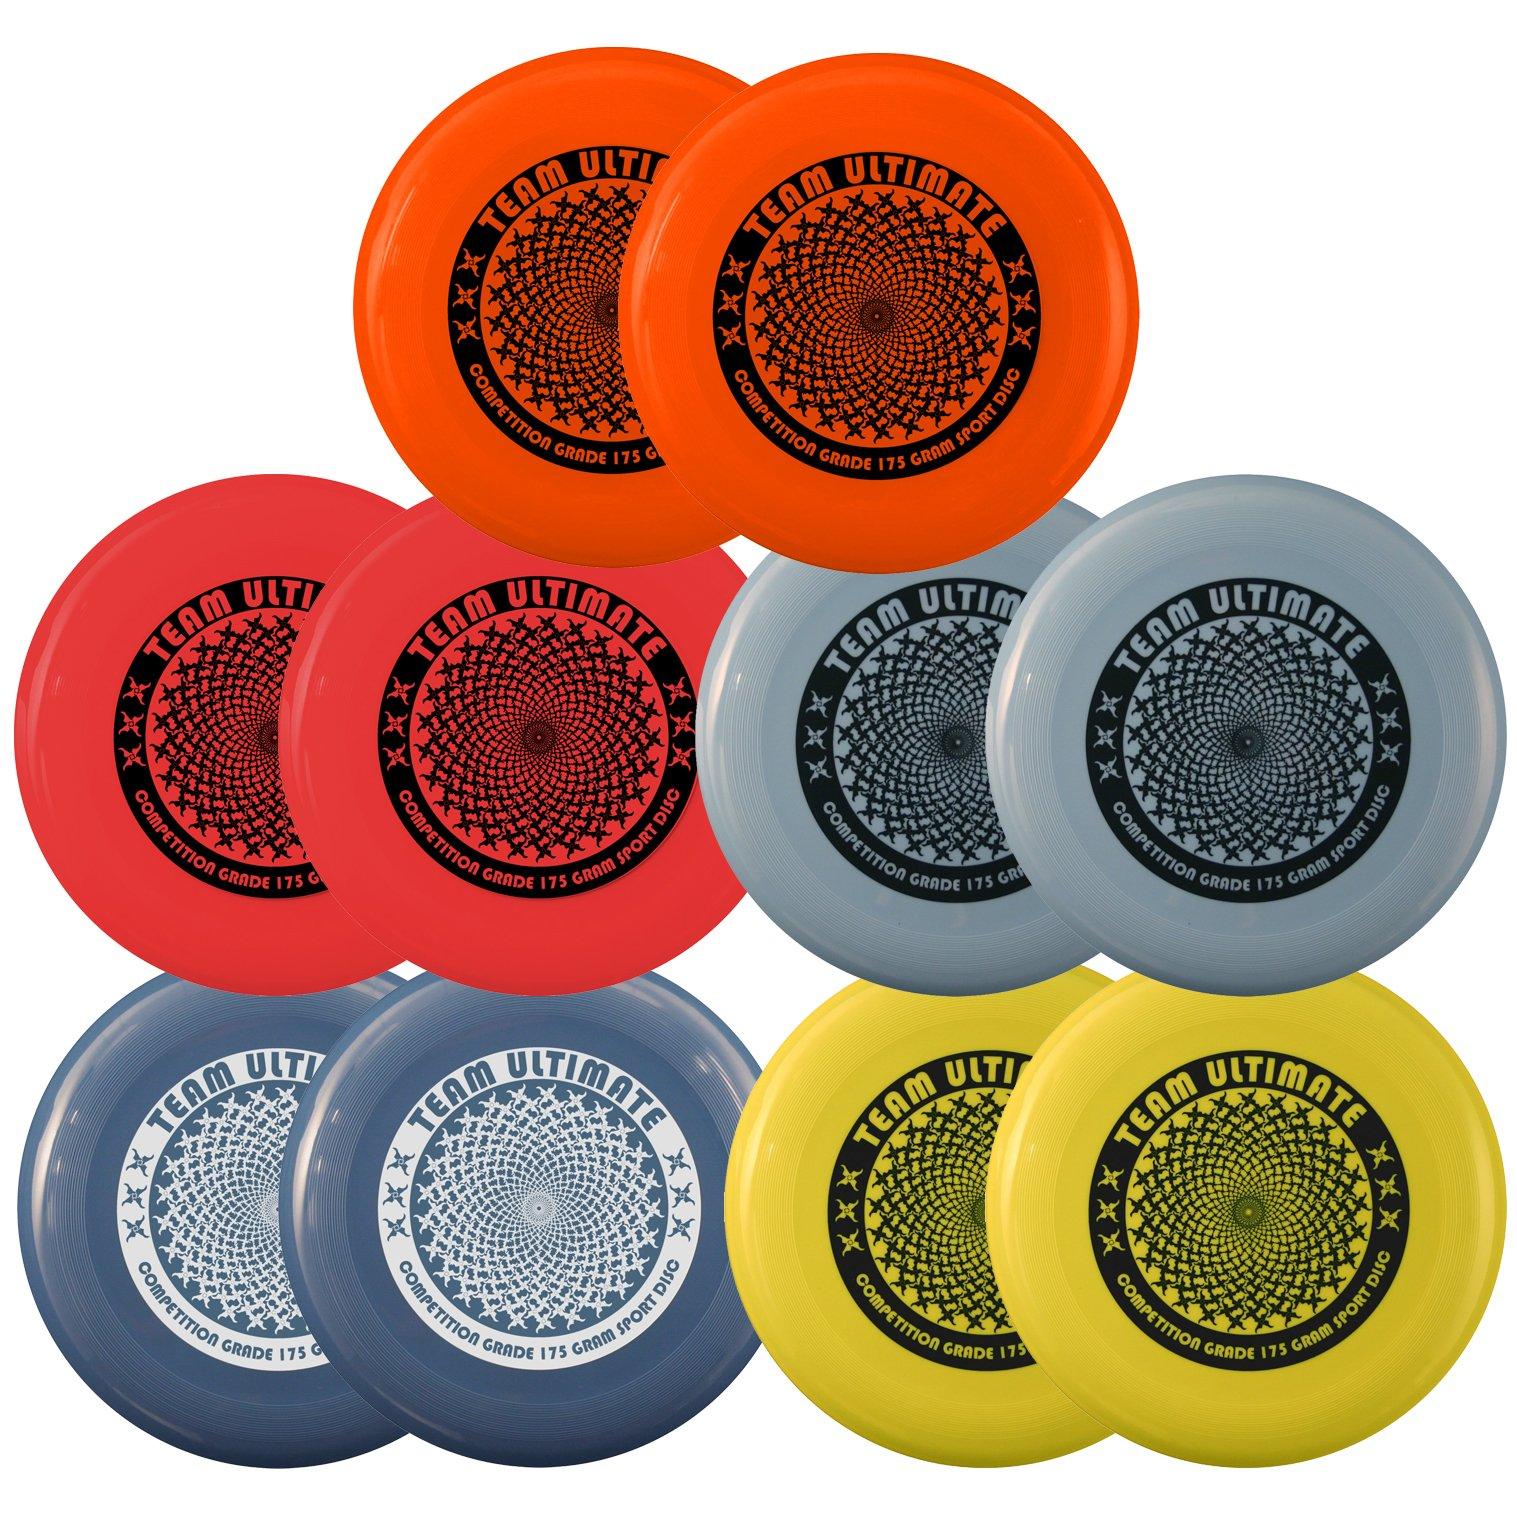 Pack of 10 Da Vinci Team Ultimate 175 Gram, 10.75 Inch Flying Sport Discs, 5 Colors